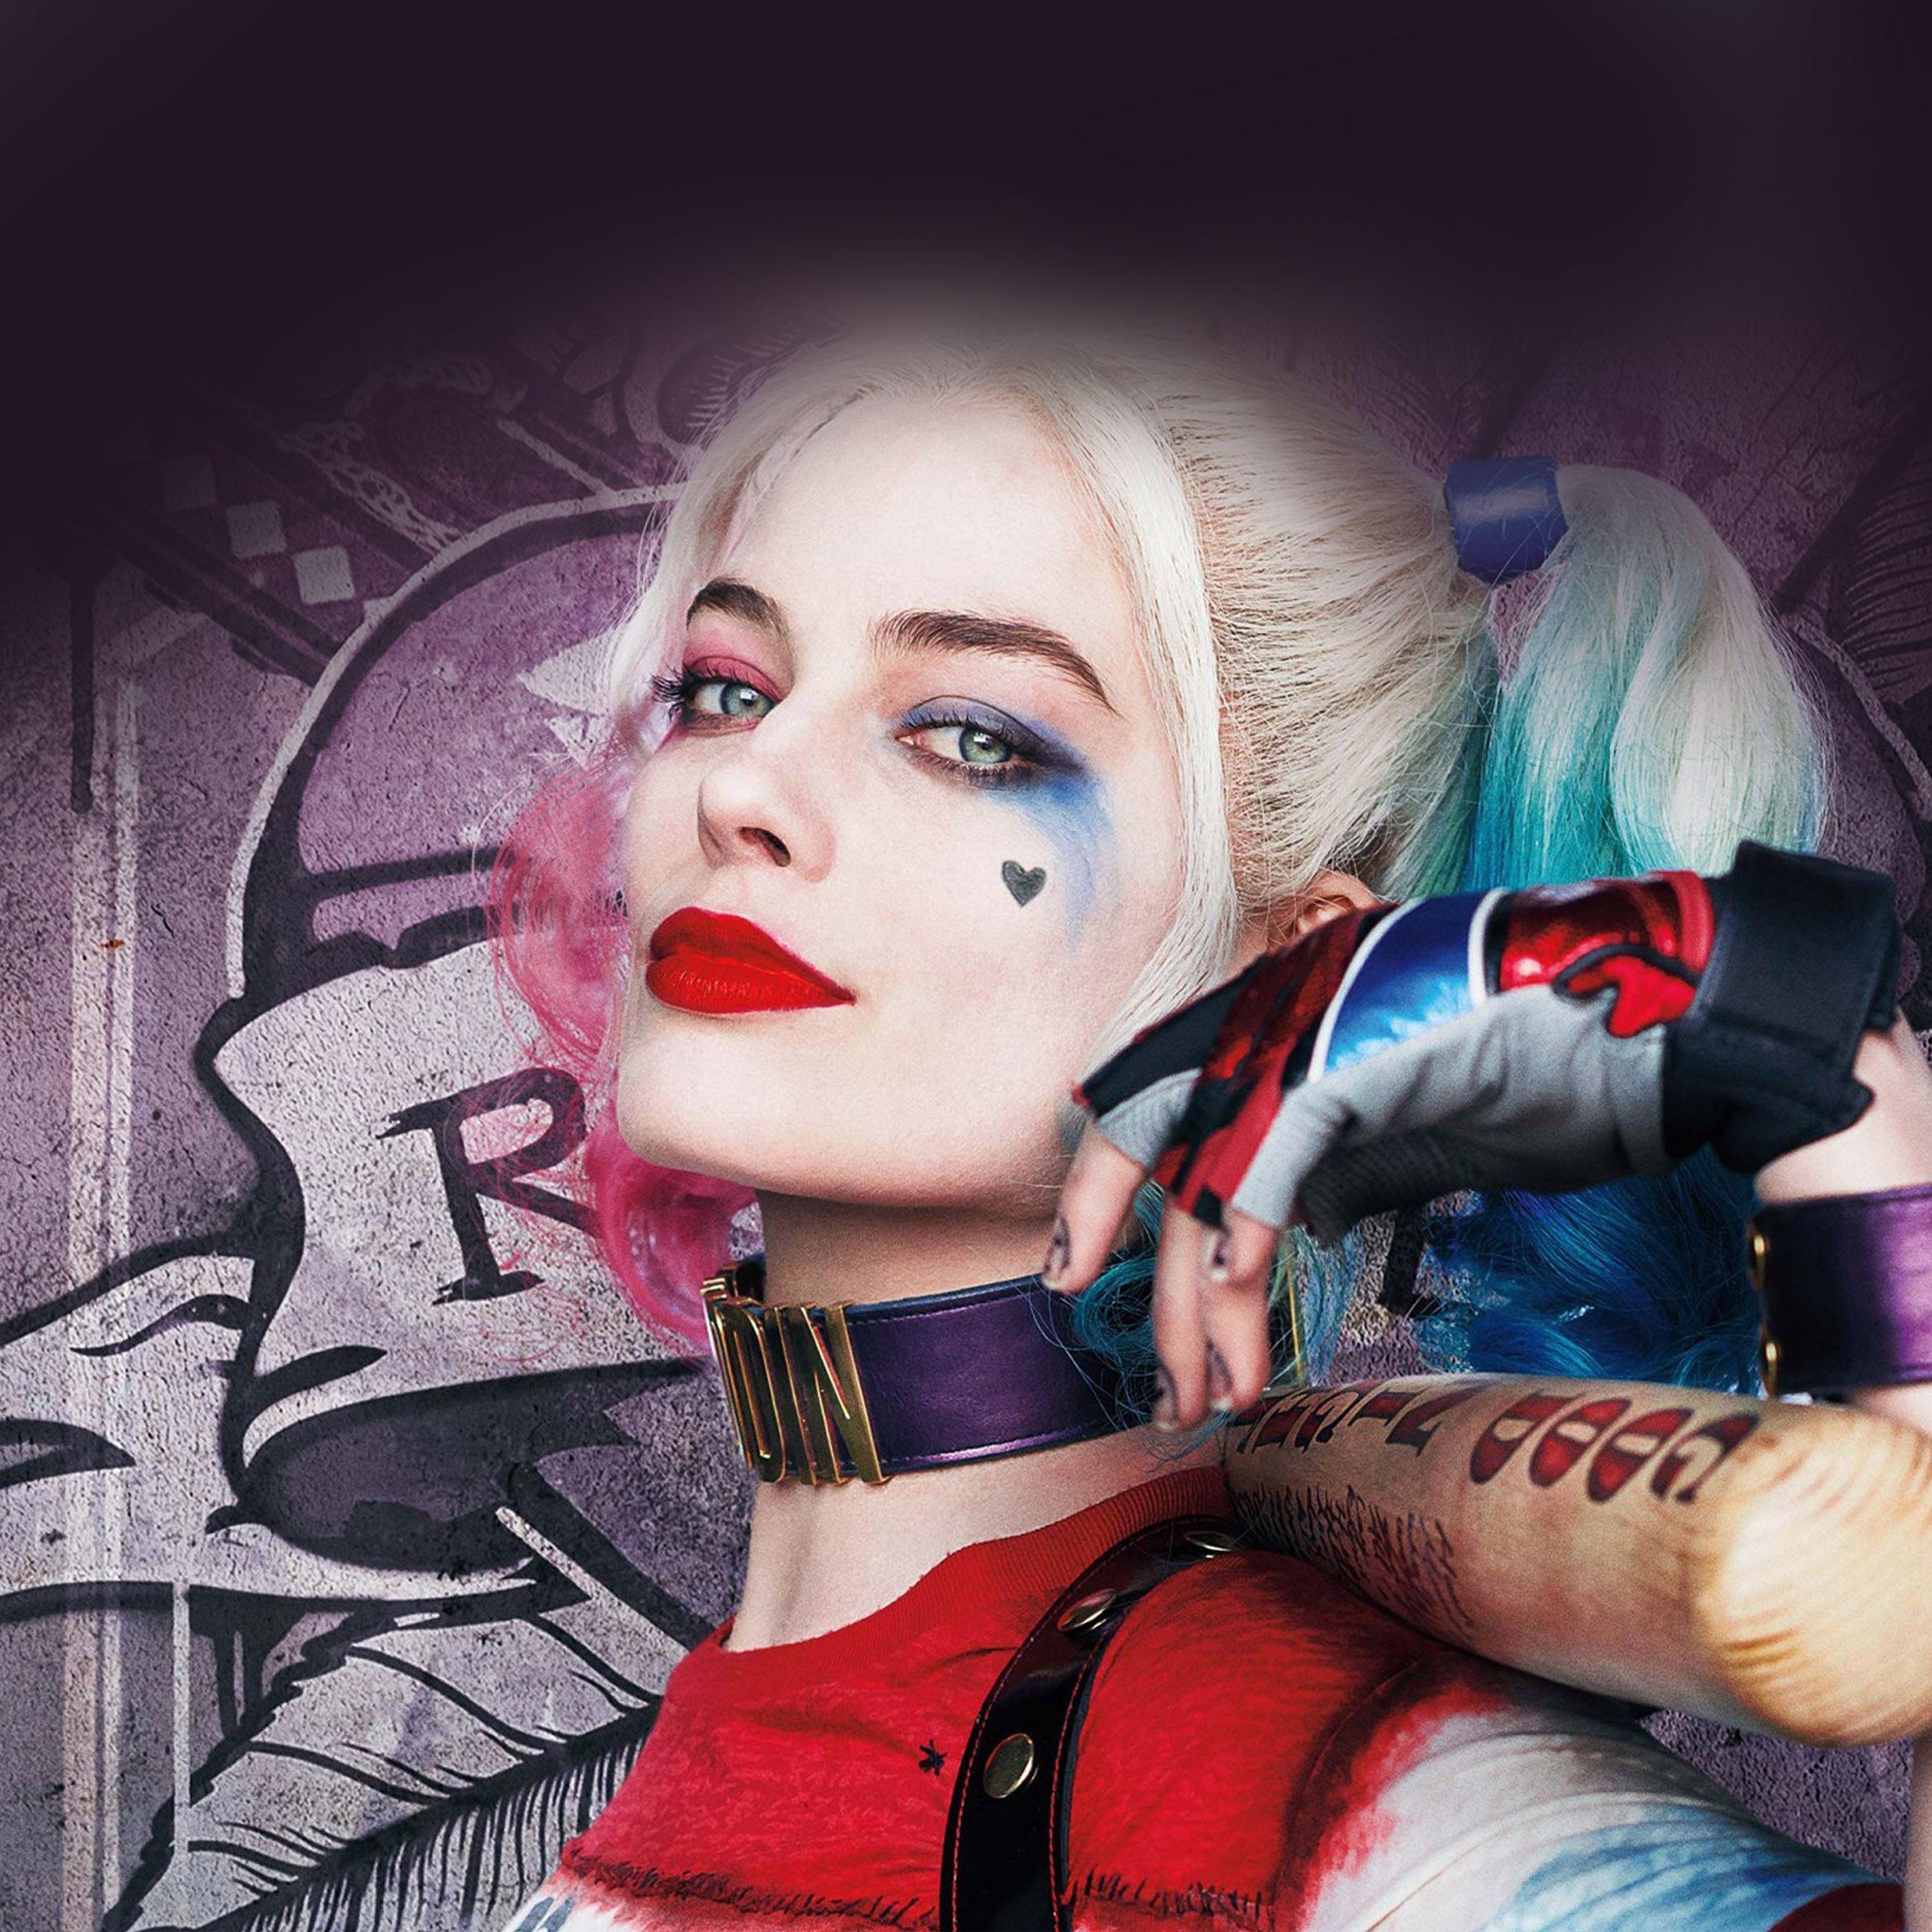 Joker Girl Wallpapers Wallpaper Cave